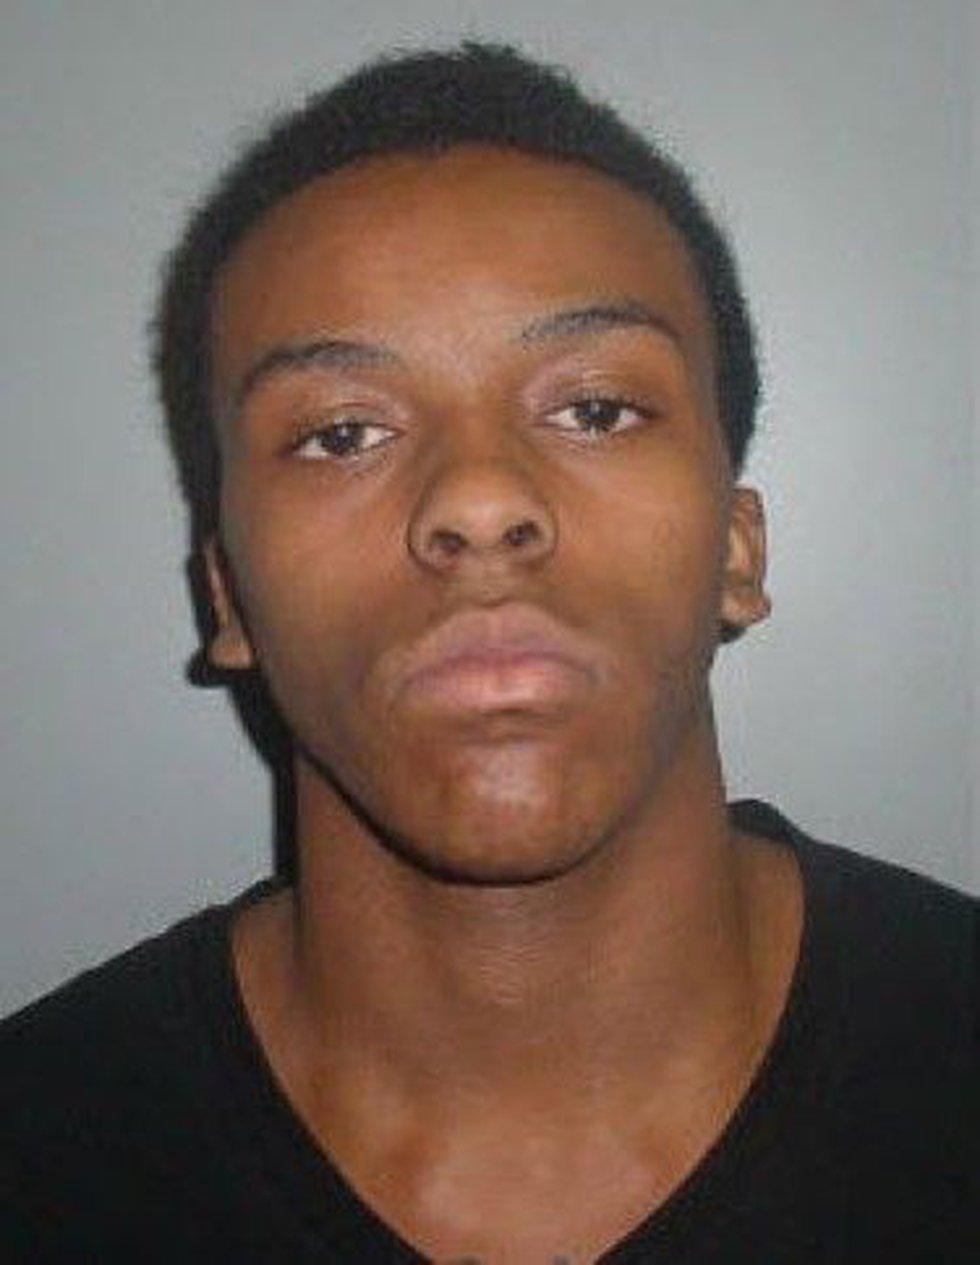 16-year-old Maurice Lamont Burris